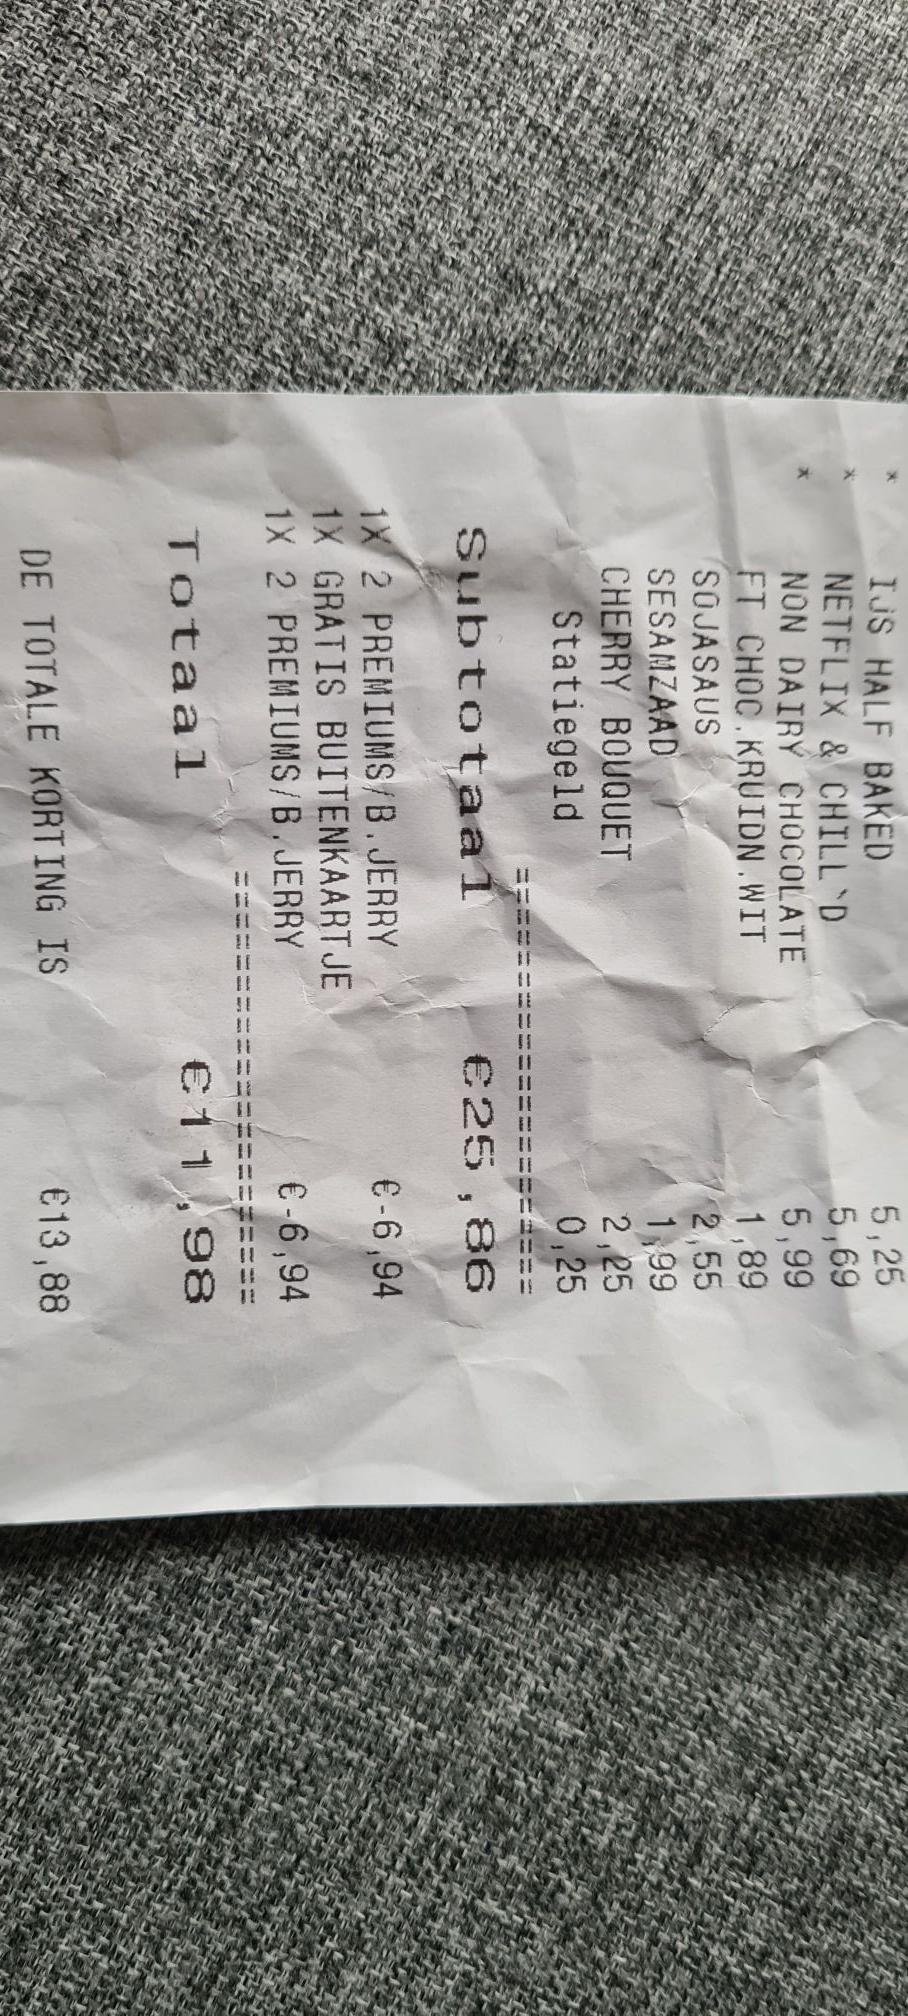 Prijsfout ben & Jerry's 3 bekers €3,05 @ Plus